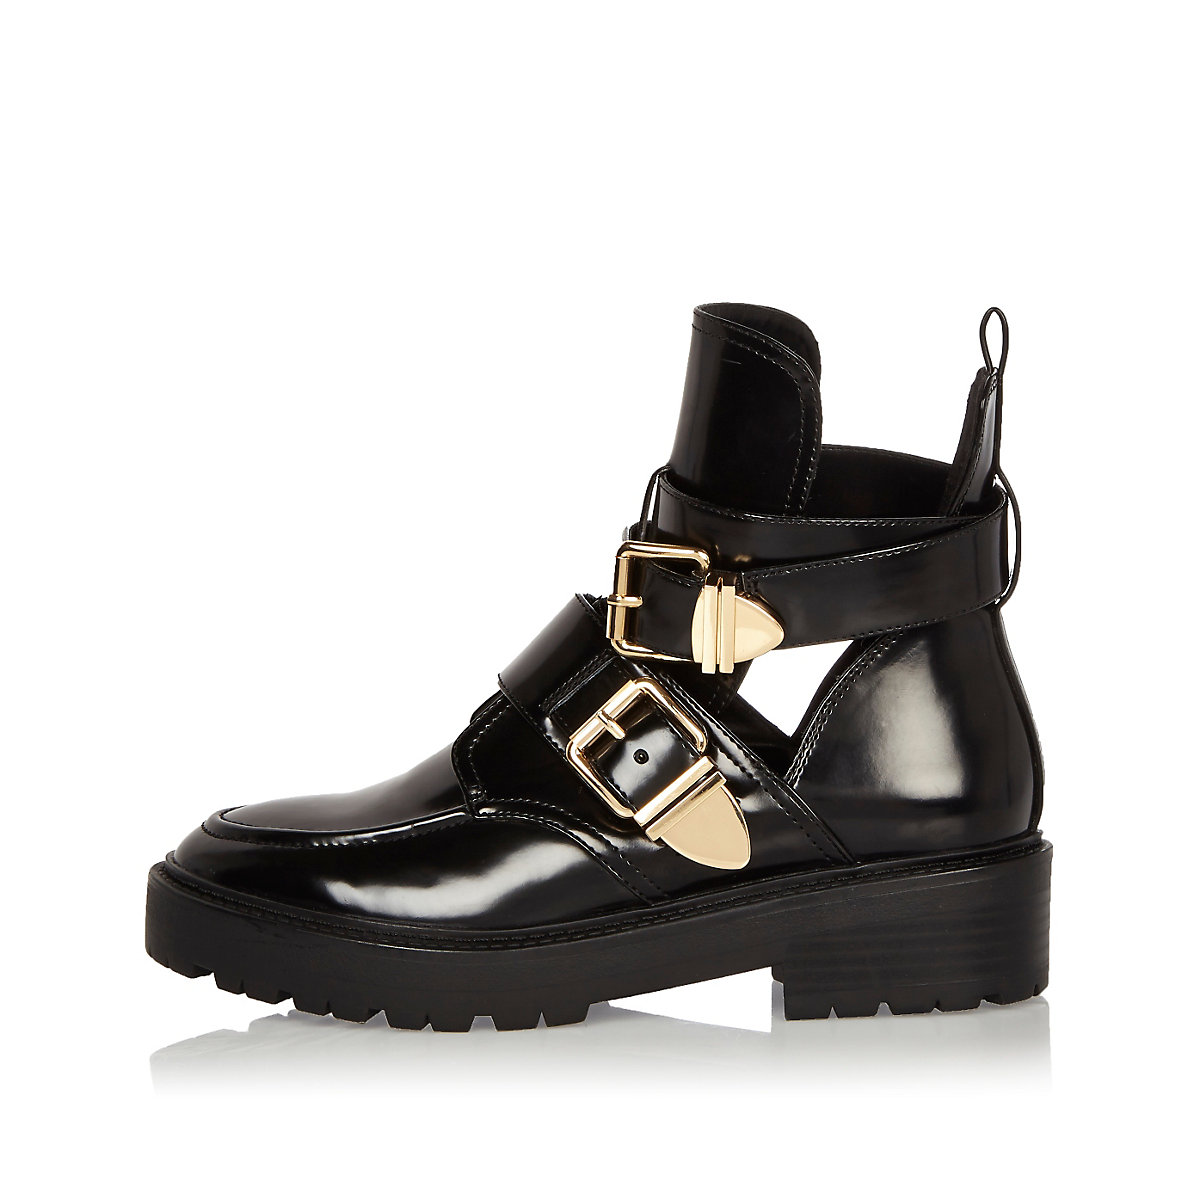 Black patent cut-out boots